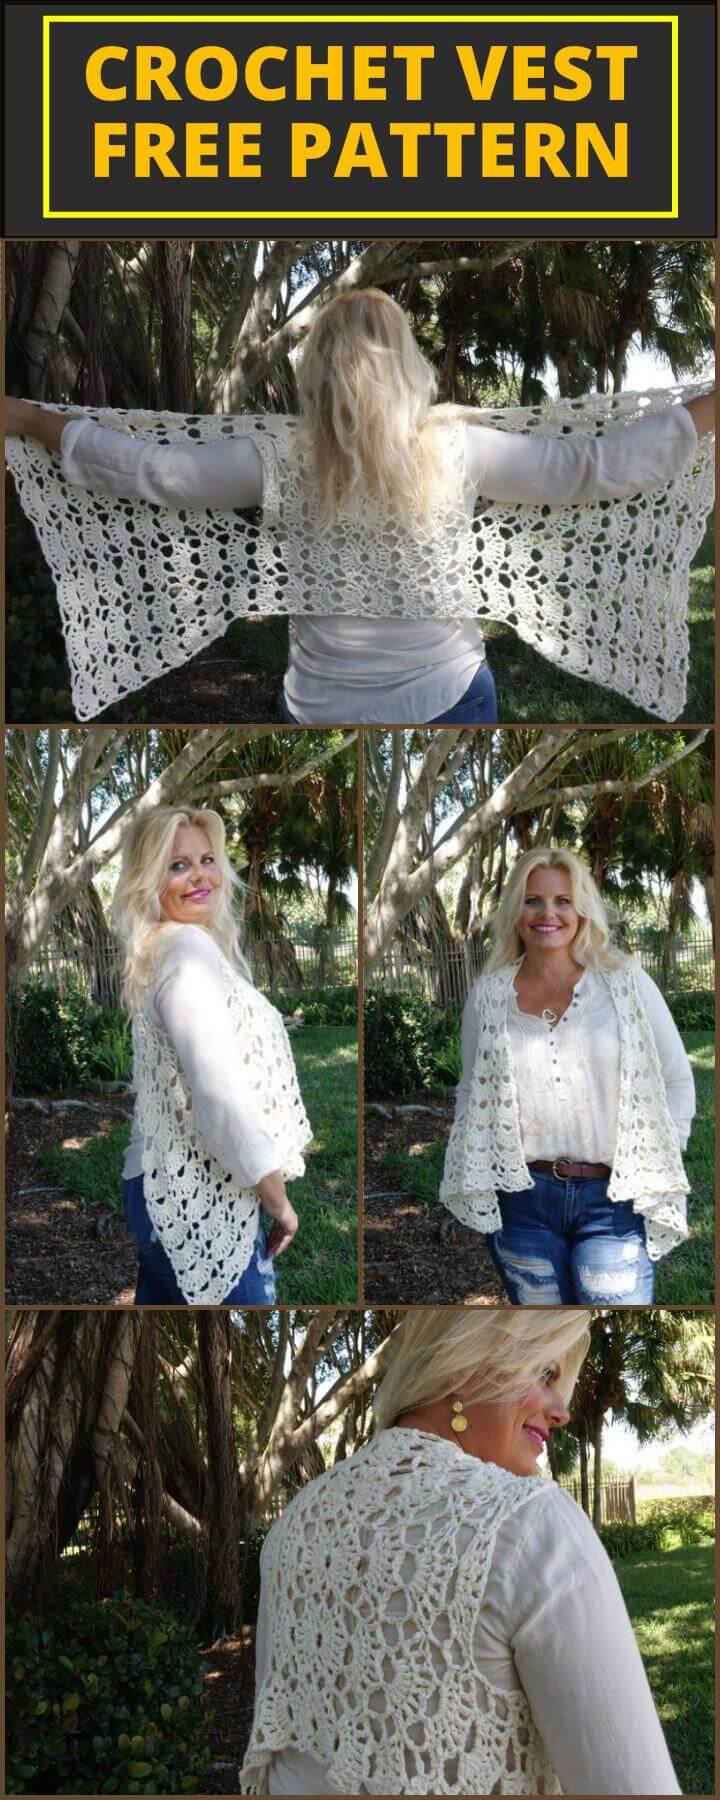 Stylish Crochet Vest Free Pattern